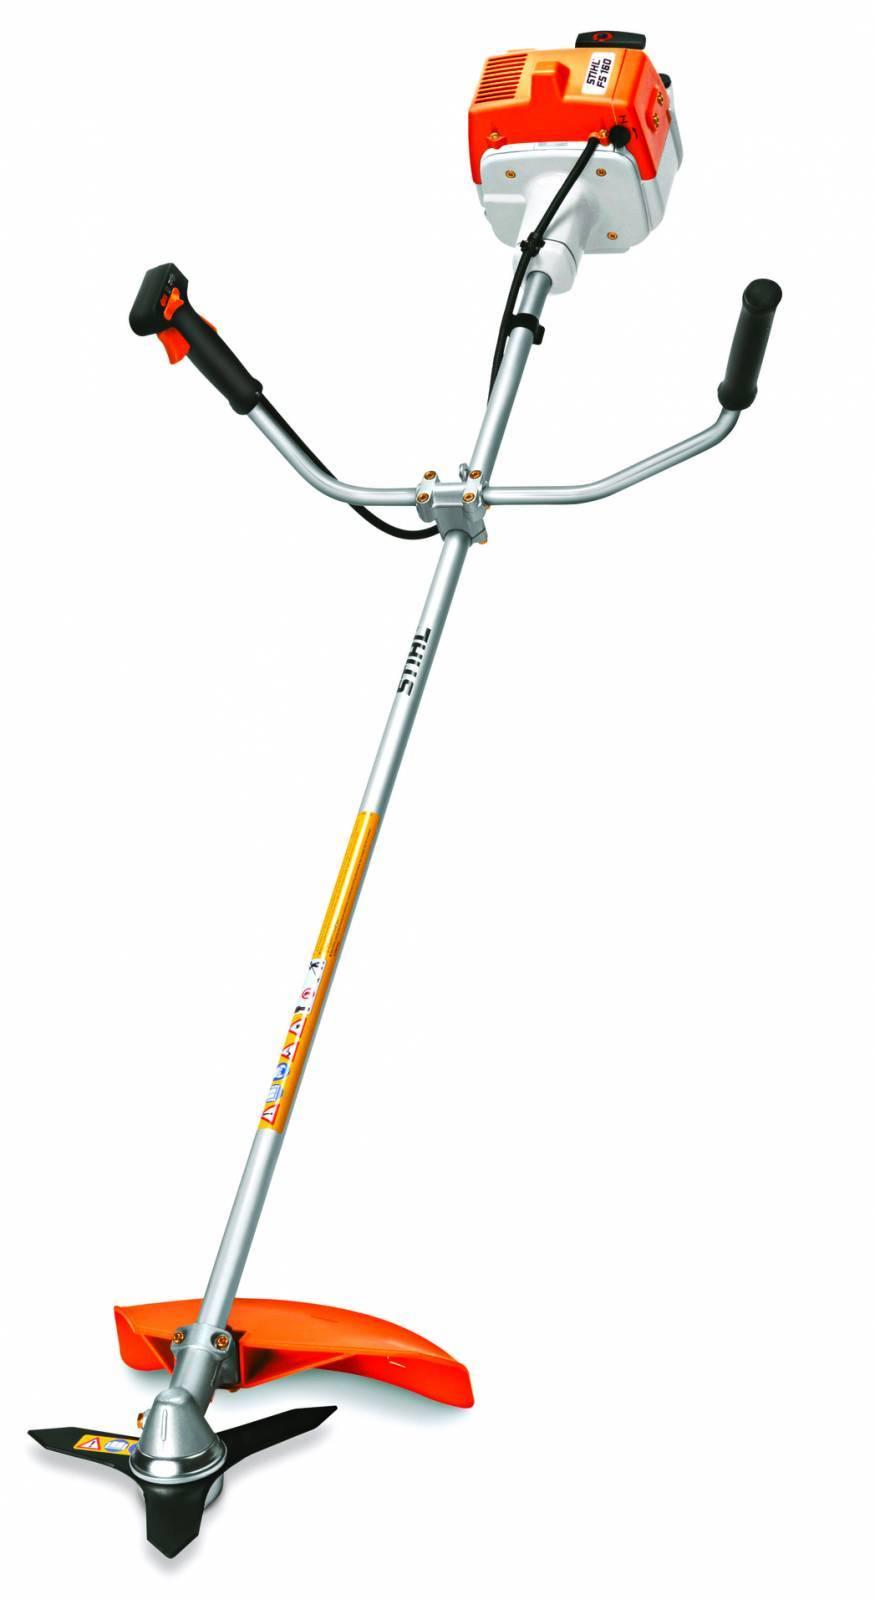 Roçadeira Stihl FS 160